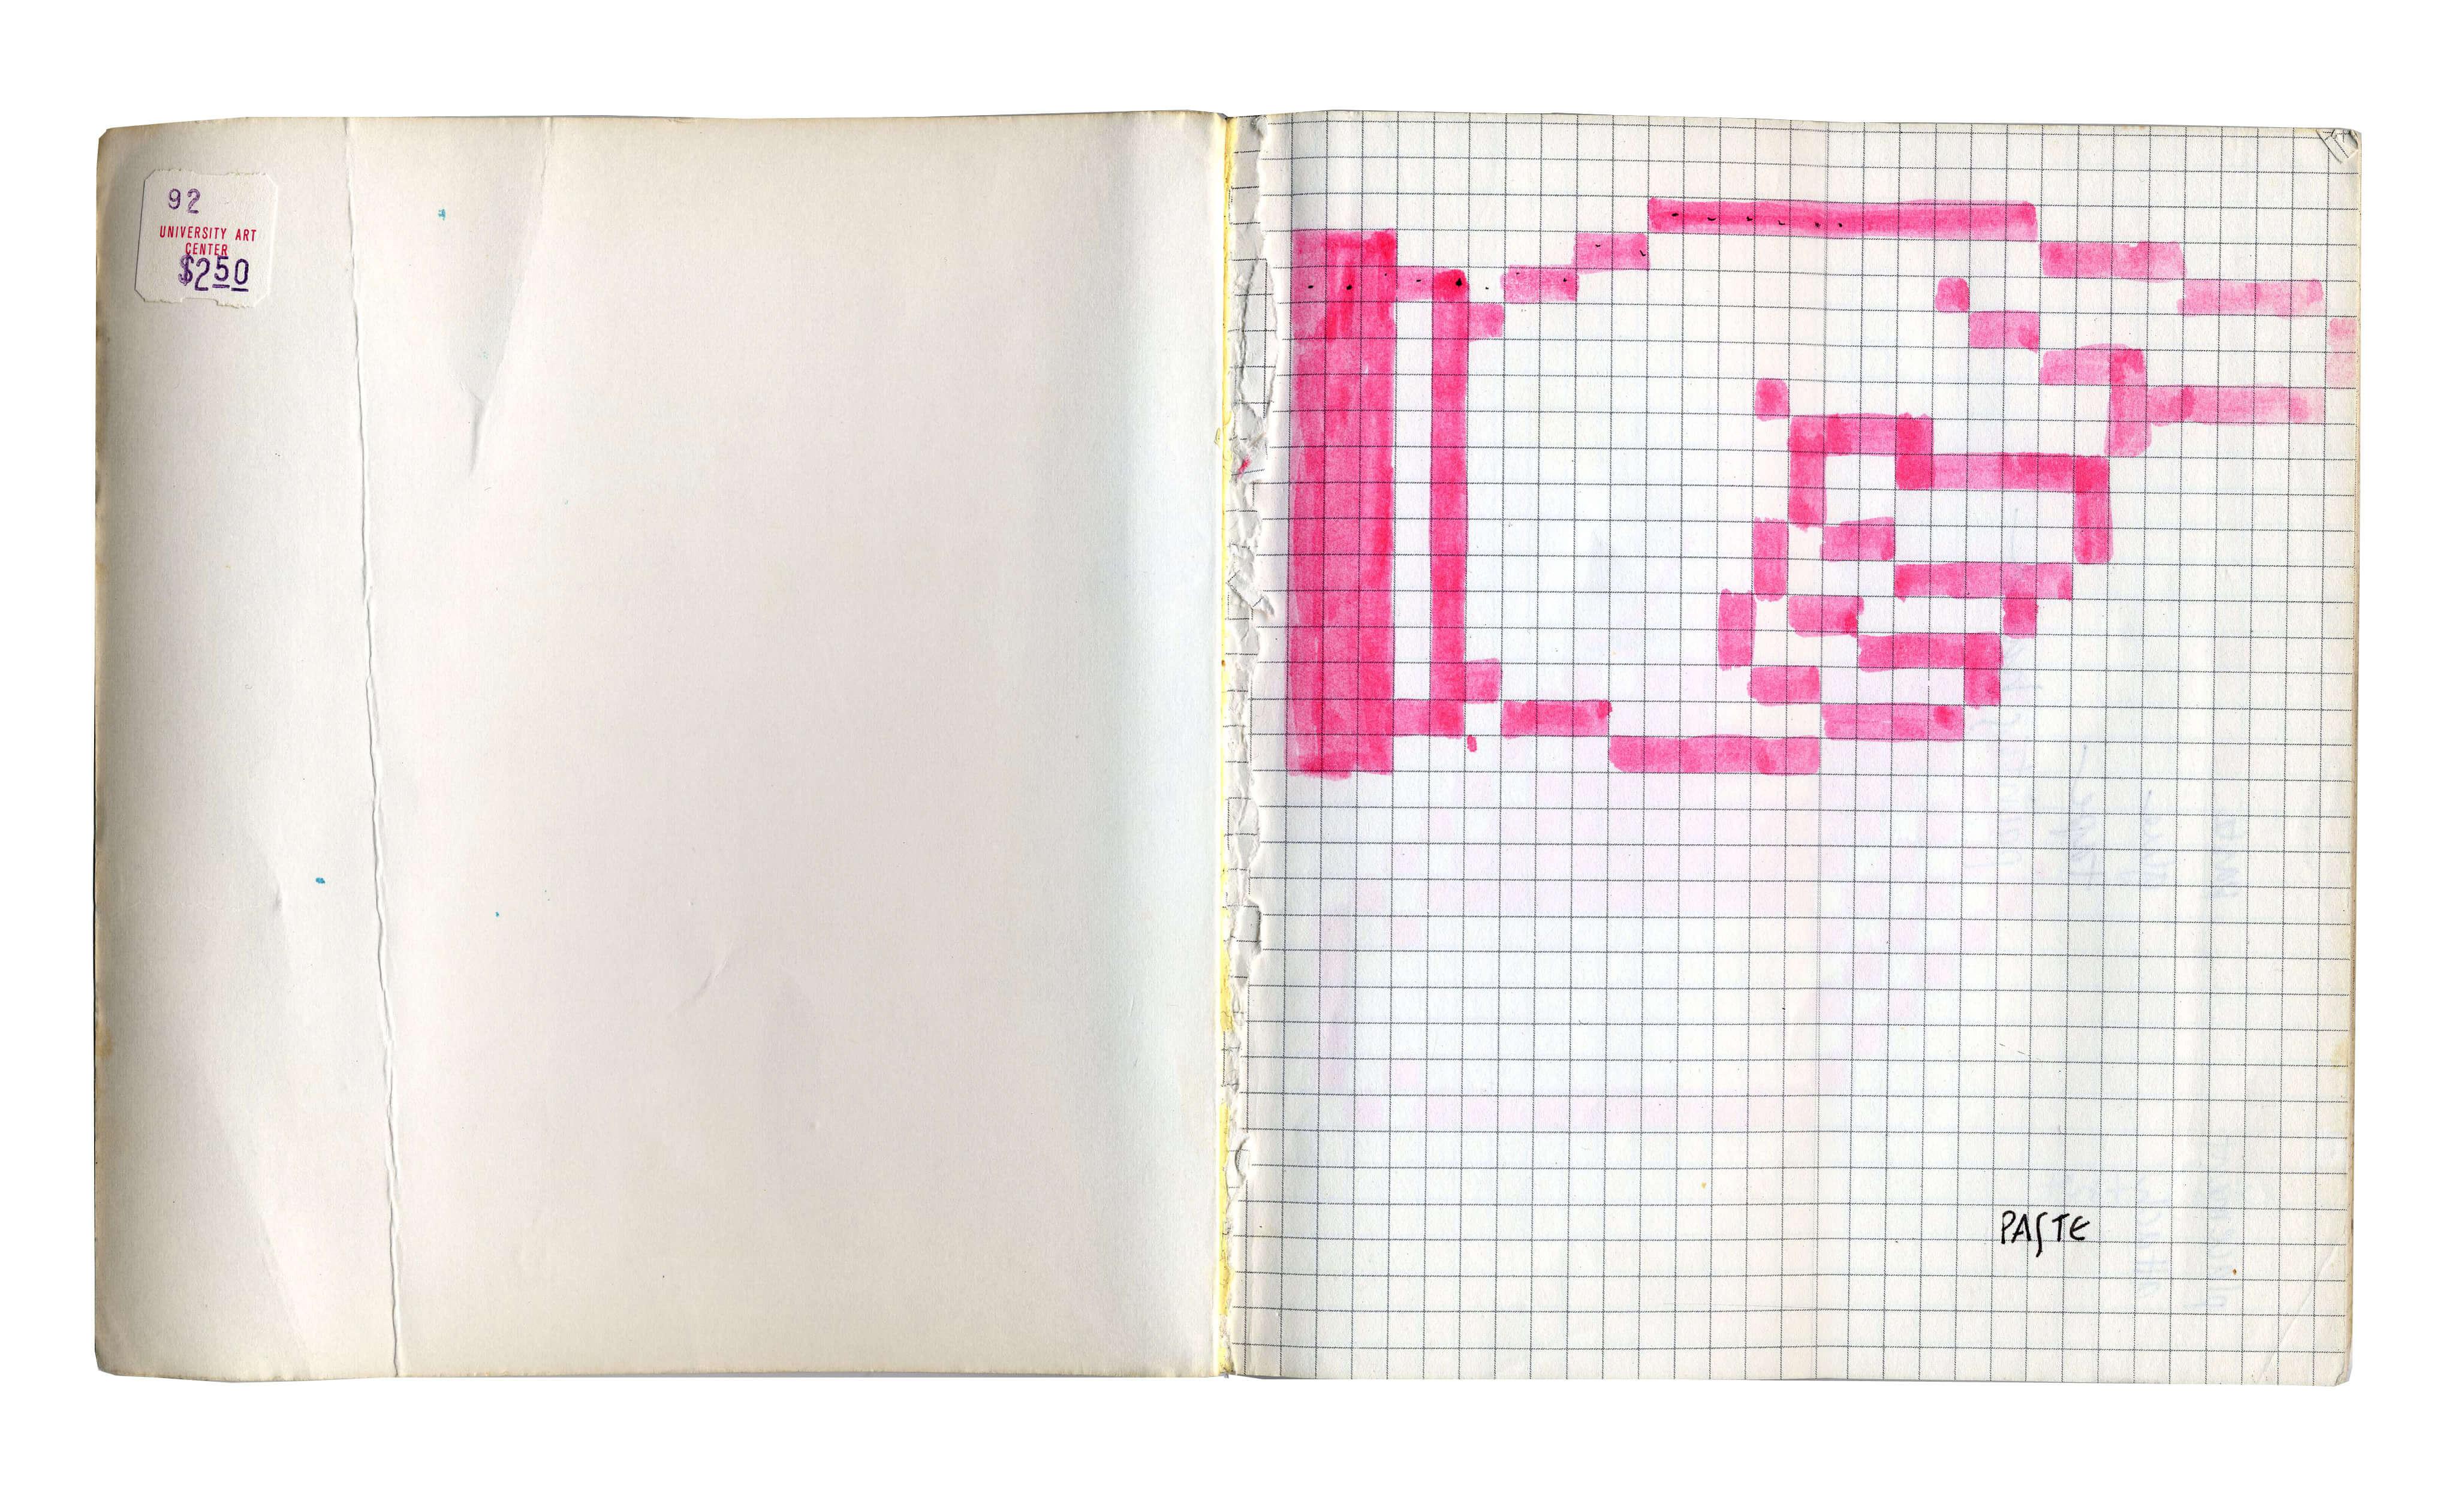 Susan-Kare-notebook,-courtesy-of-kareprints.com